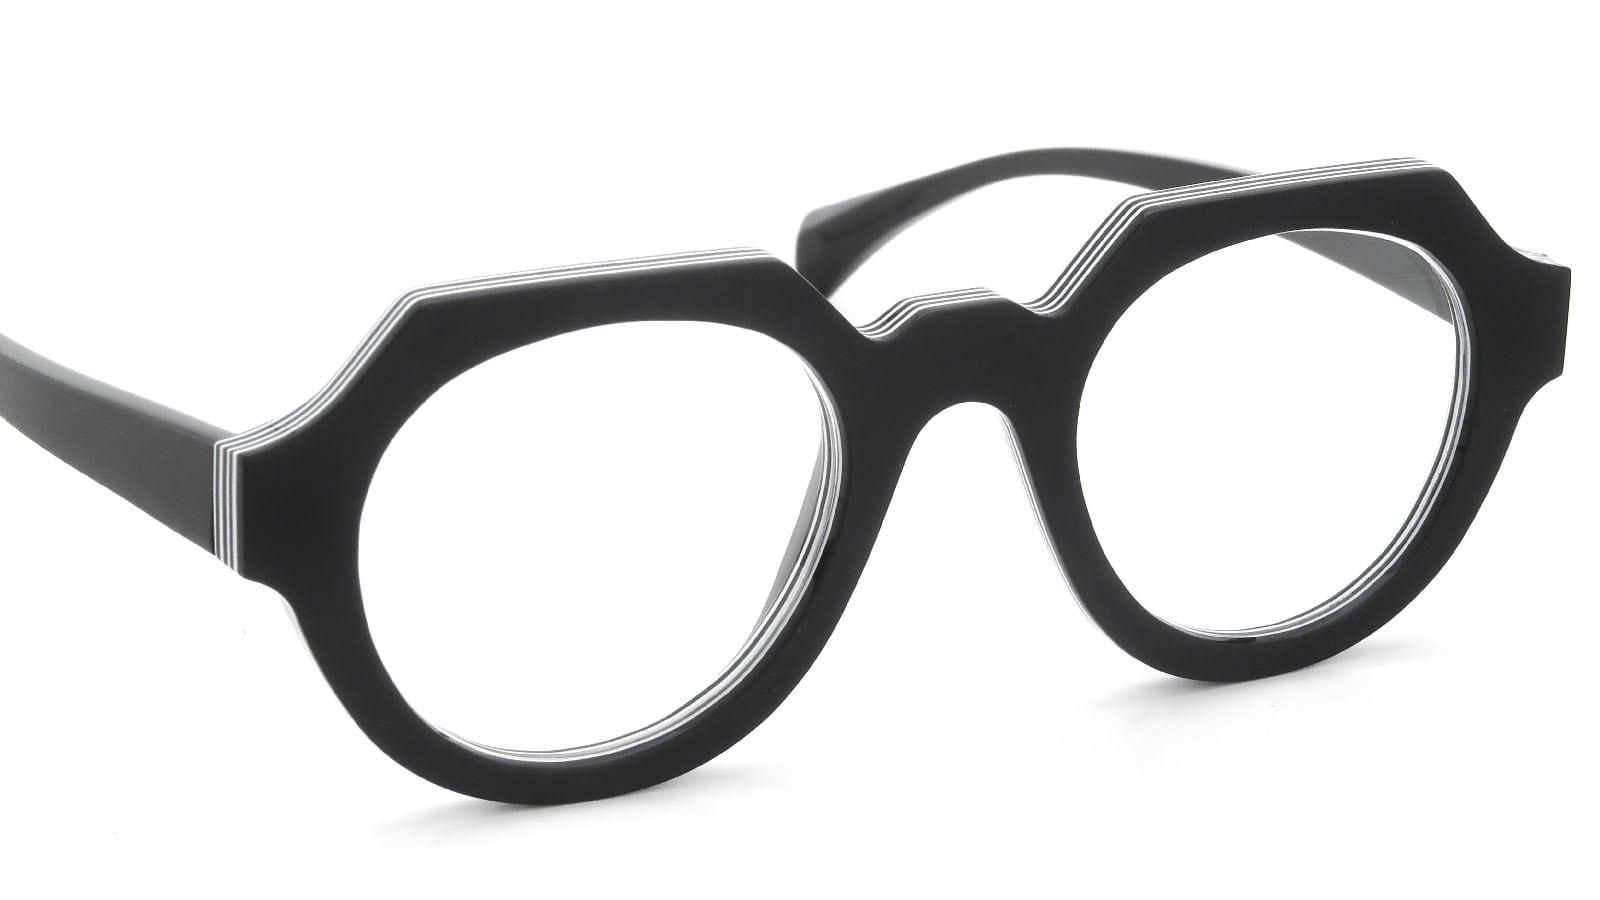 Jacques durand PRASLIN 248 col.142 HM-BLACK/Black and white layer 6